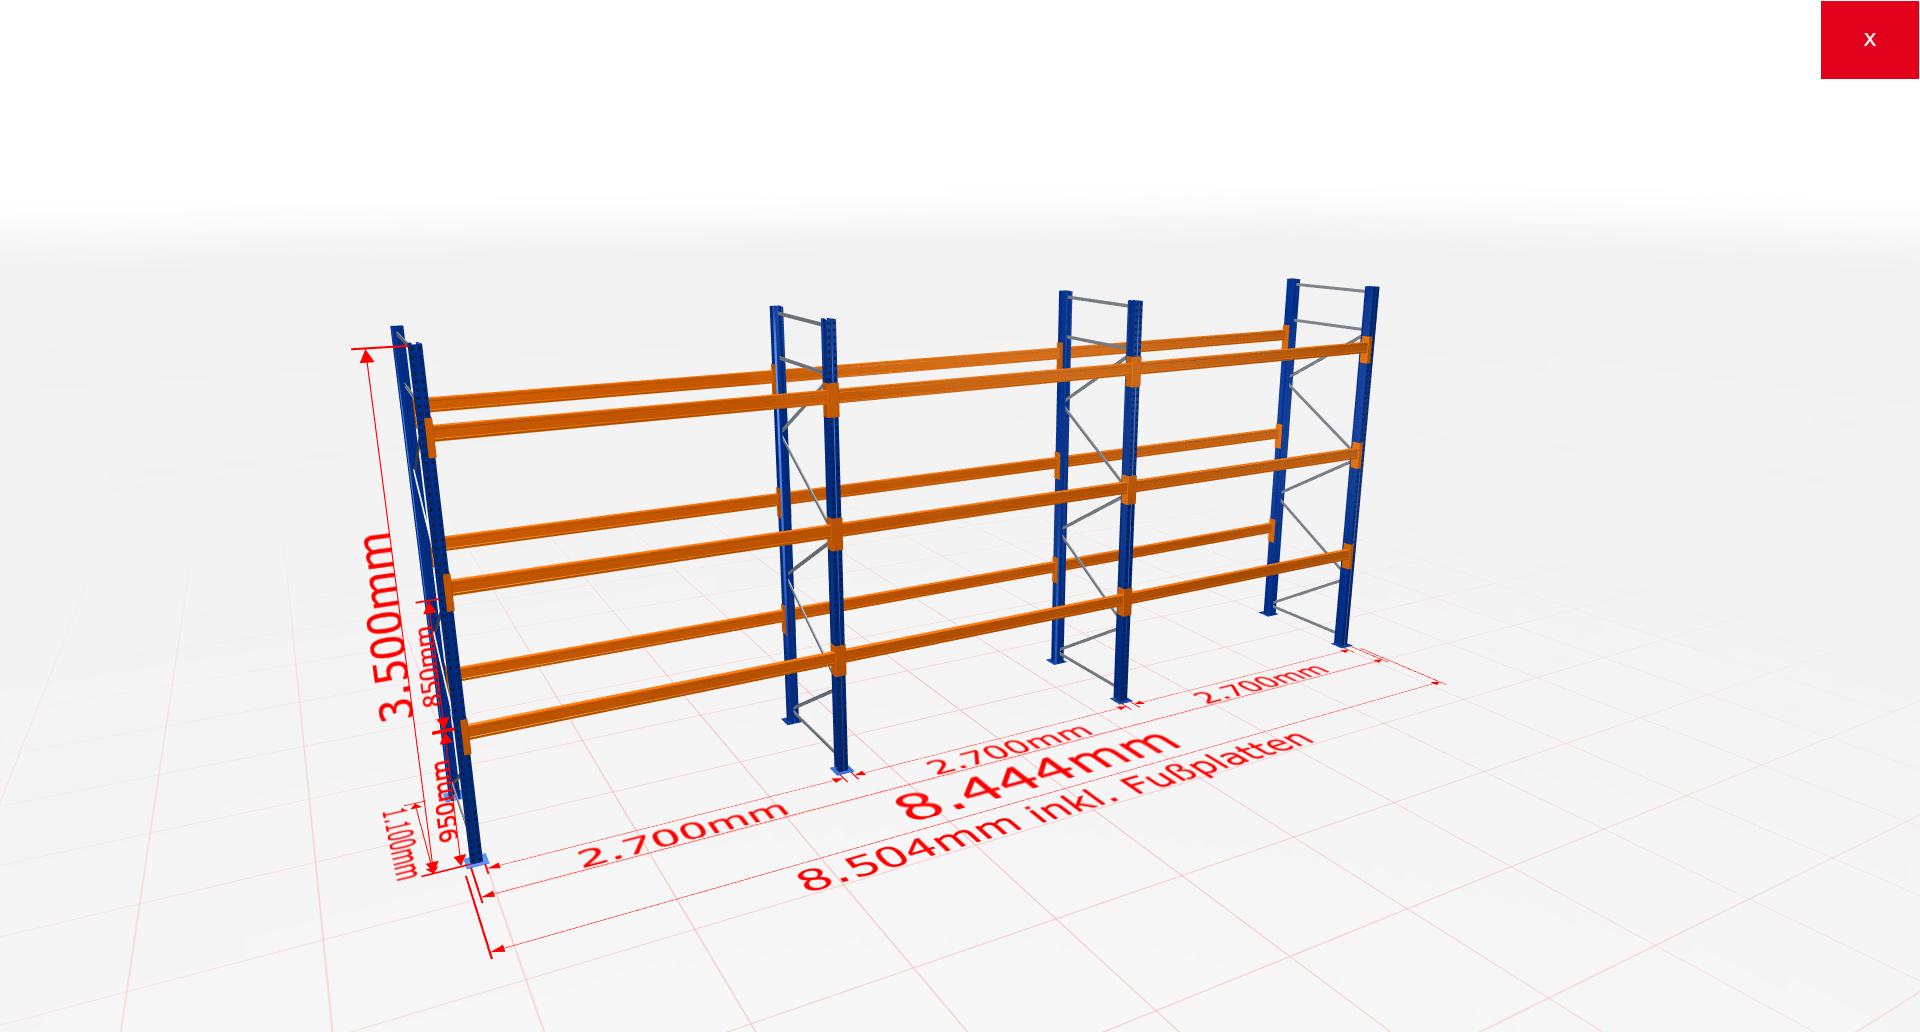 Palettenregal Komplettregal 3500x8444x1100 mm (HxBxT) 3 Fachebenen SCHULTE Lagertechnik